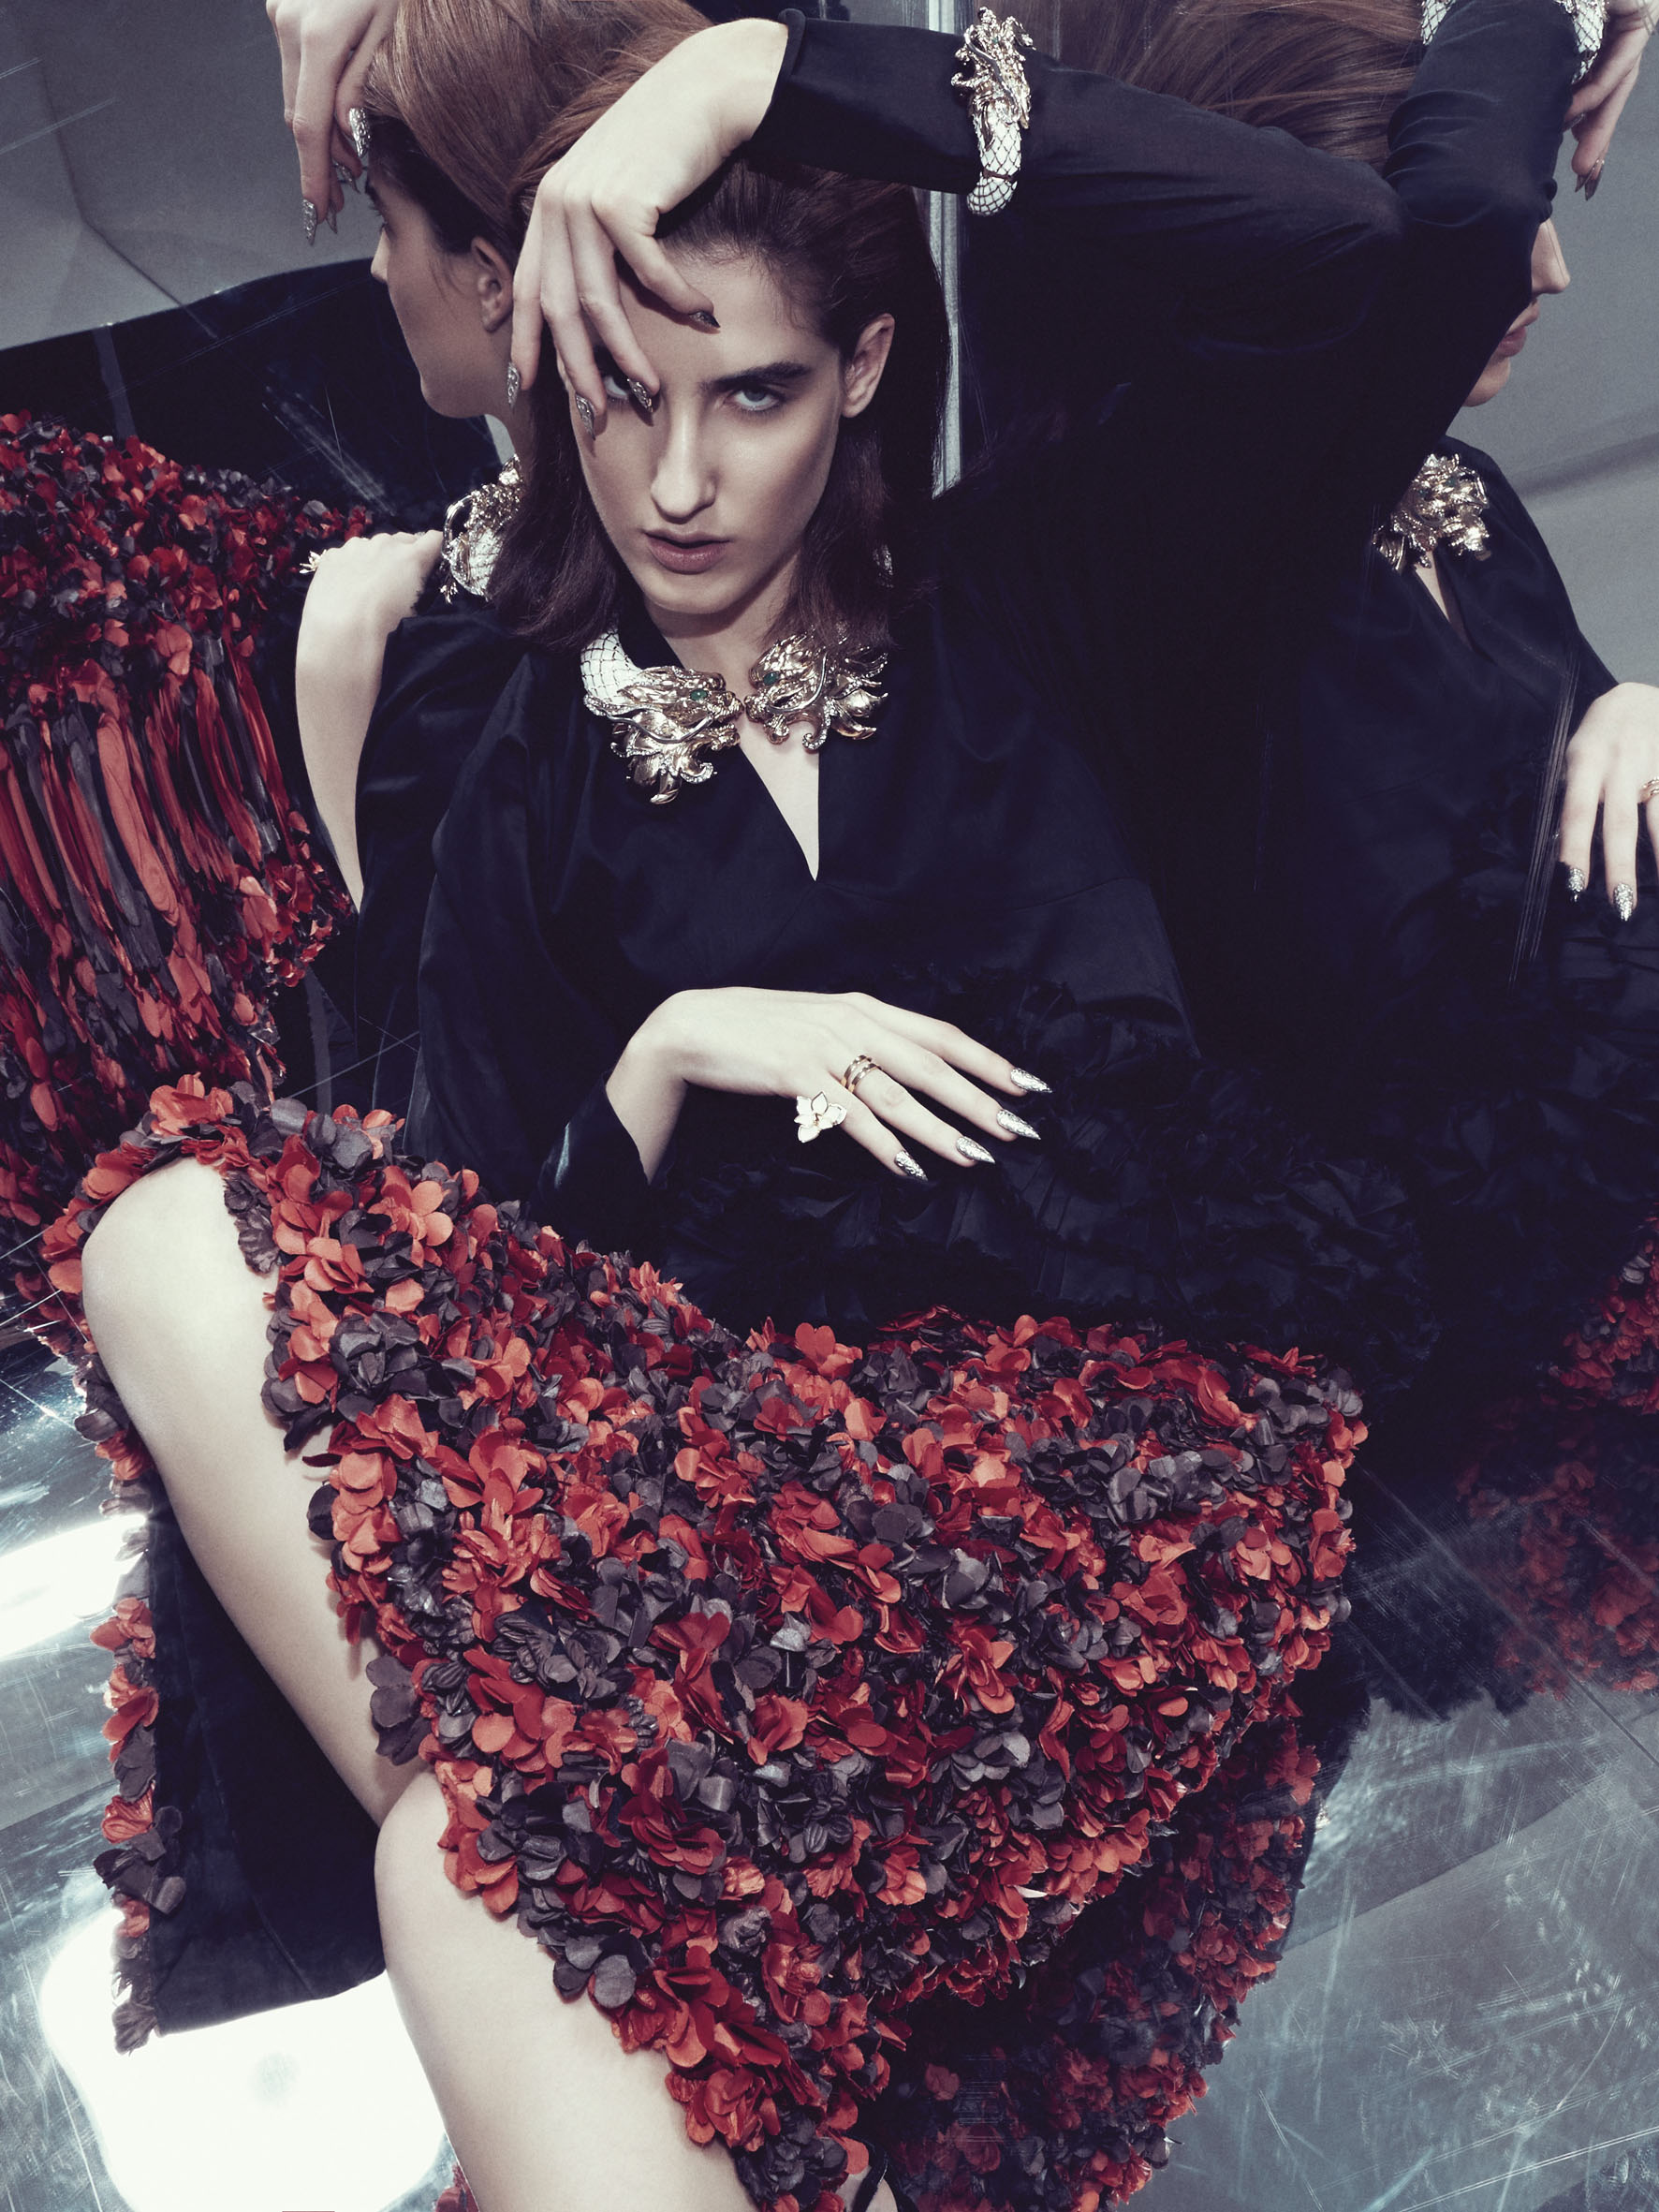 "LVR Magazine December 2013 ""Savage Reflections"" | Alessio Bolzoni | LVR Magazine | Carmel Imelda Walsh | Numerique Retouch Photo Retouching Studio"